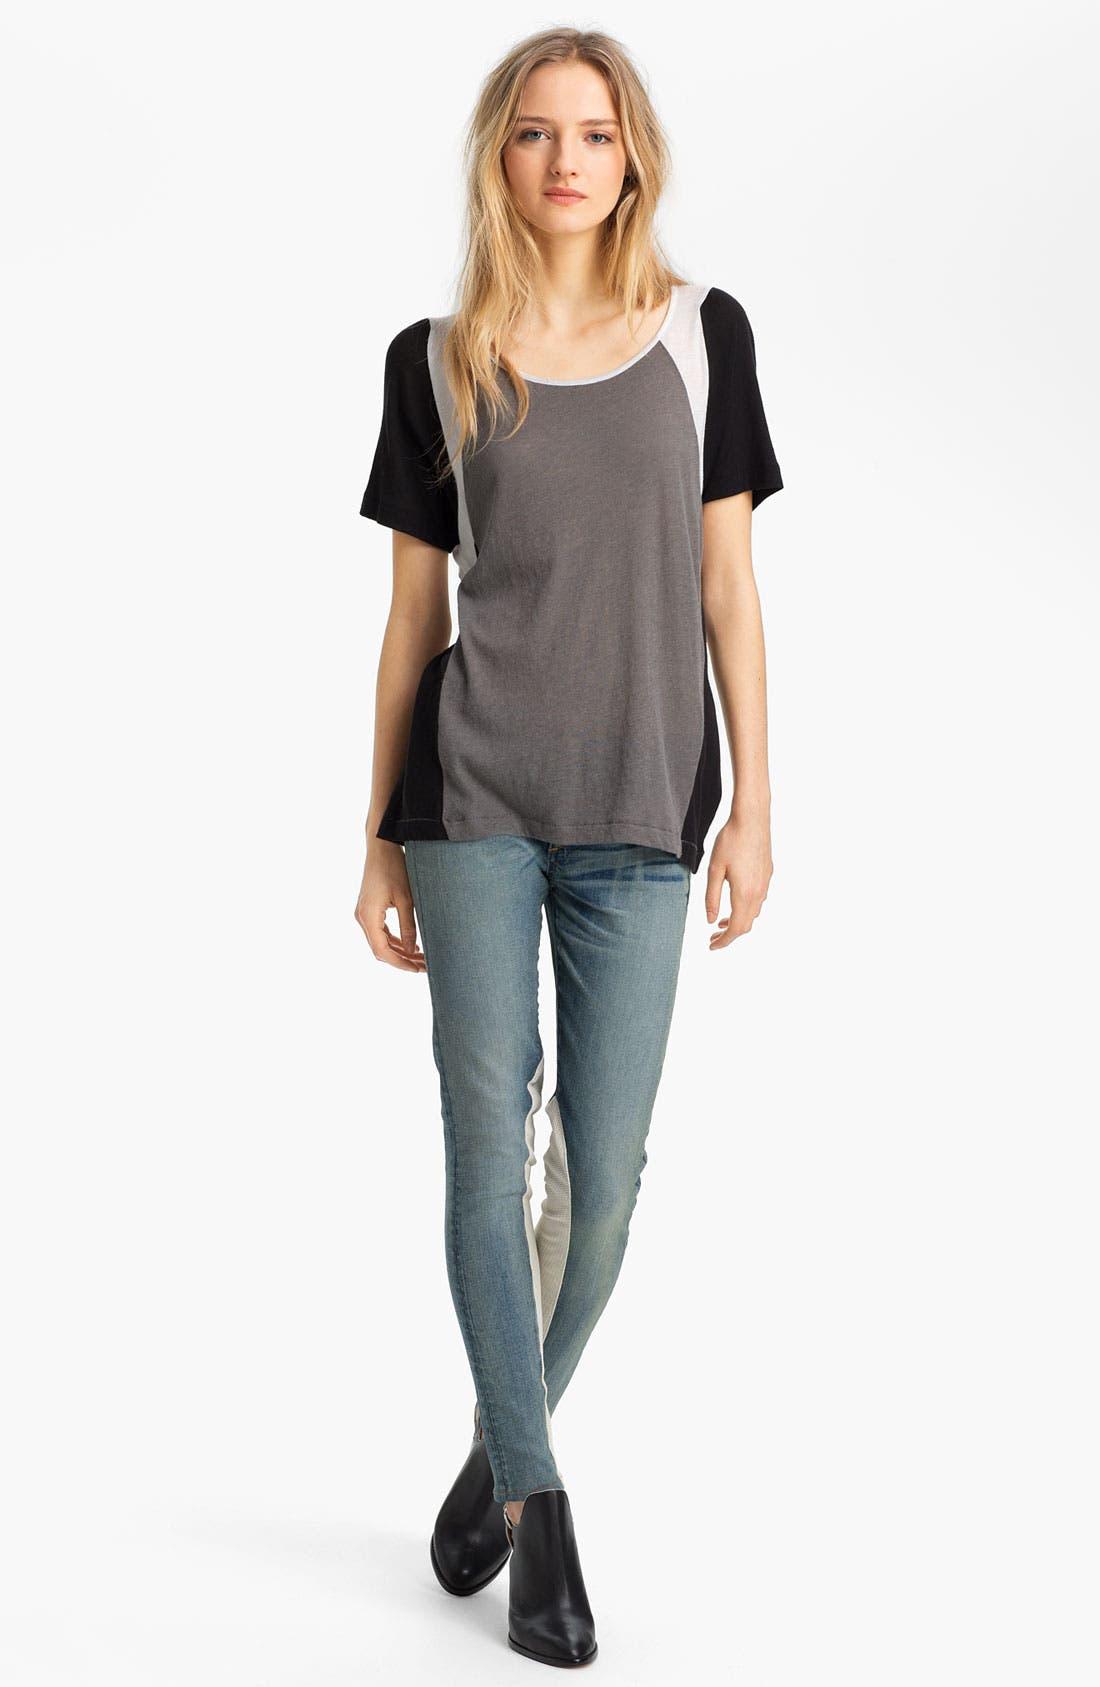 Main Image - rag & bone/JEAN Tee & Jeans